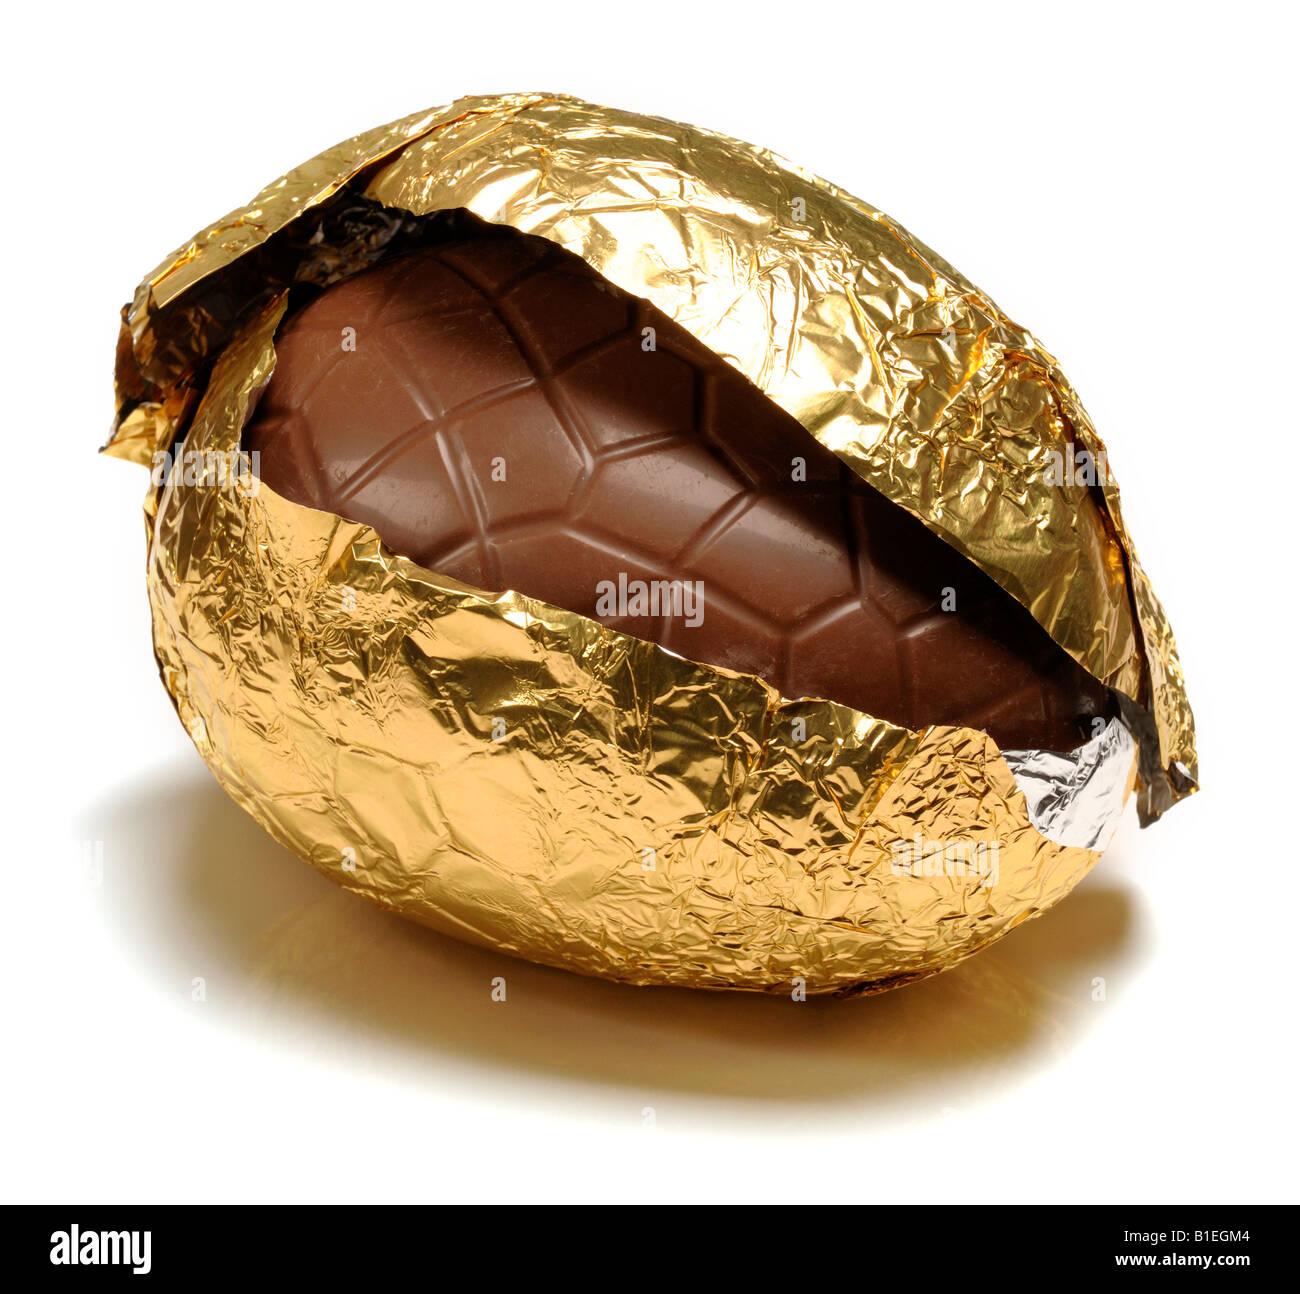 Huevo de pascua de chocolate Imagen De Stock